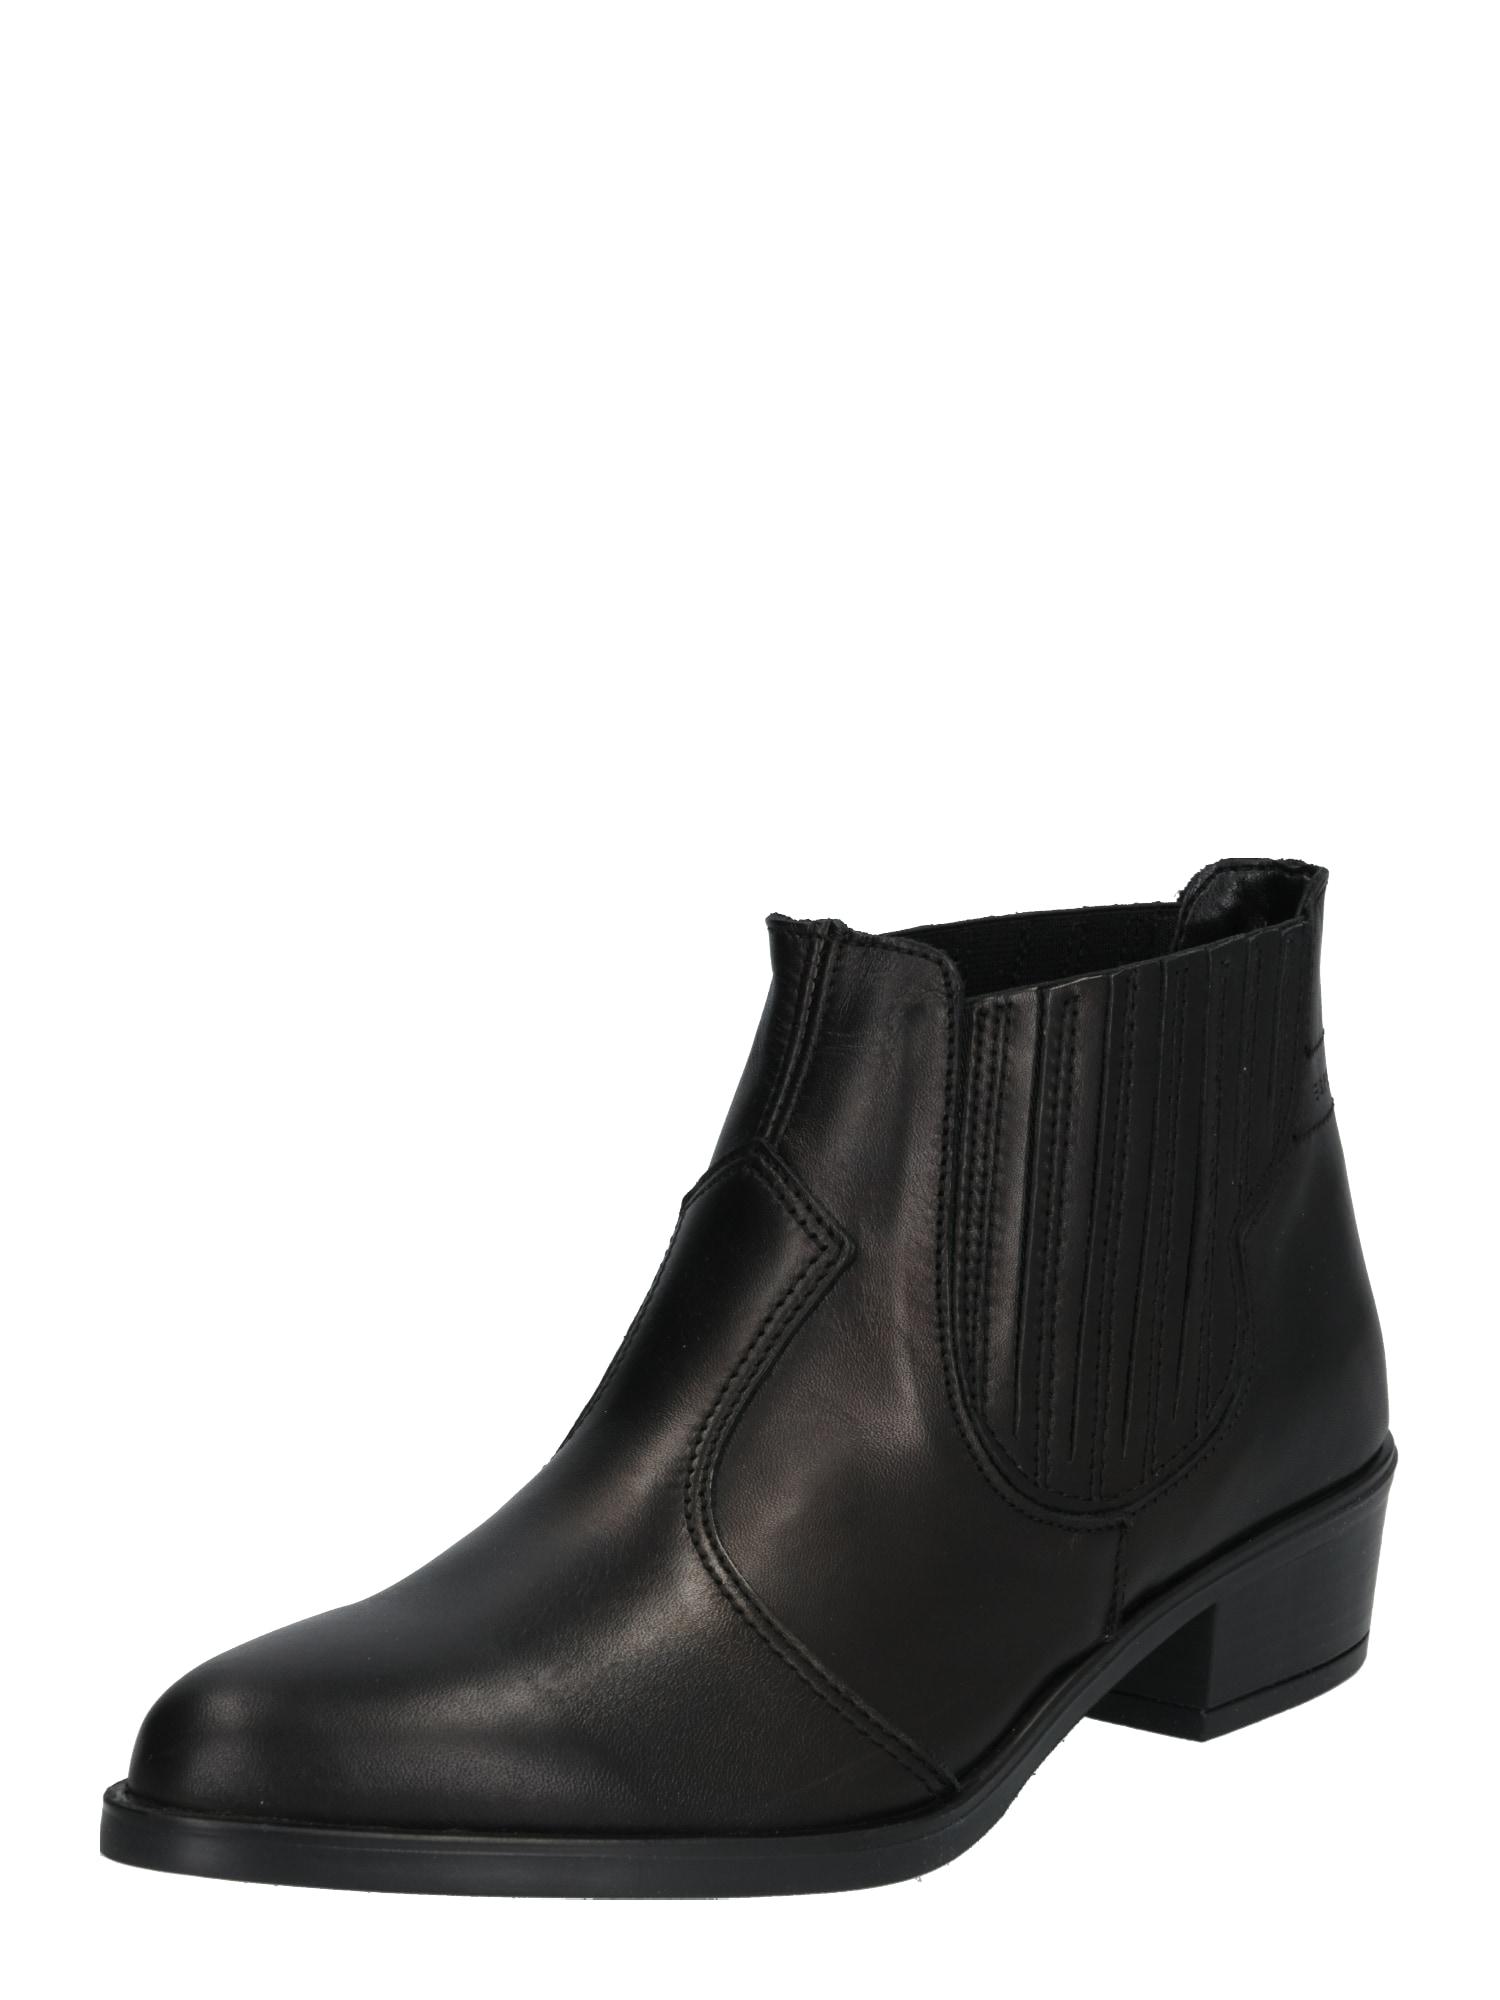 ESPRIT Aulinukai ' Coralla Bootie Formal Shoes ' juoda